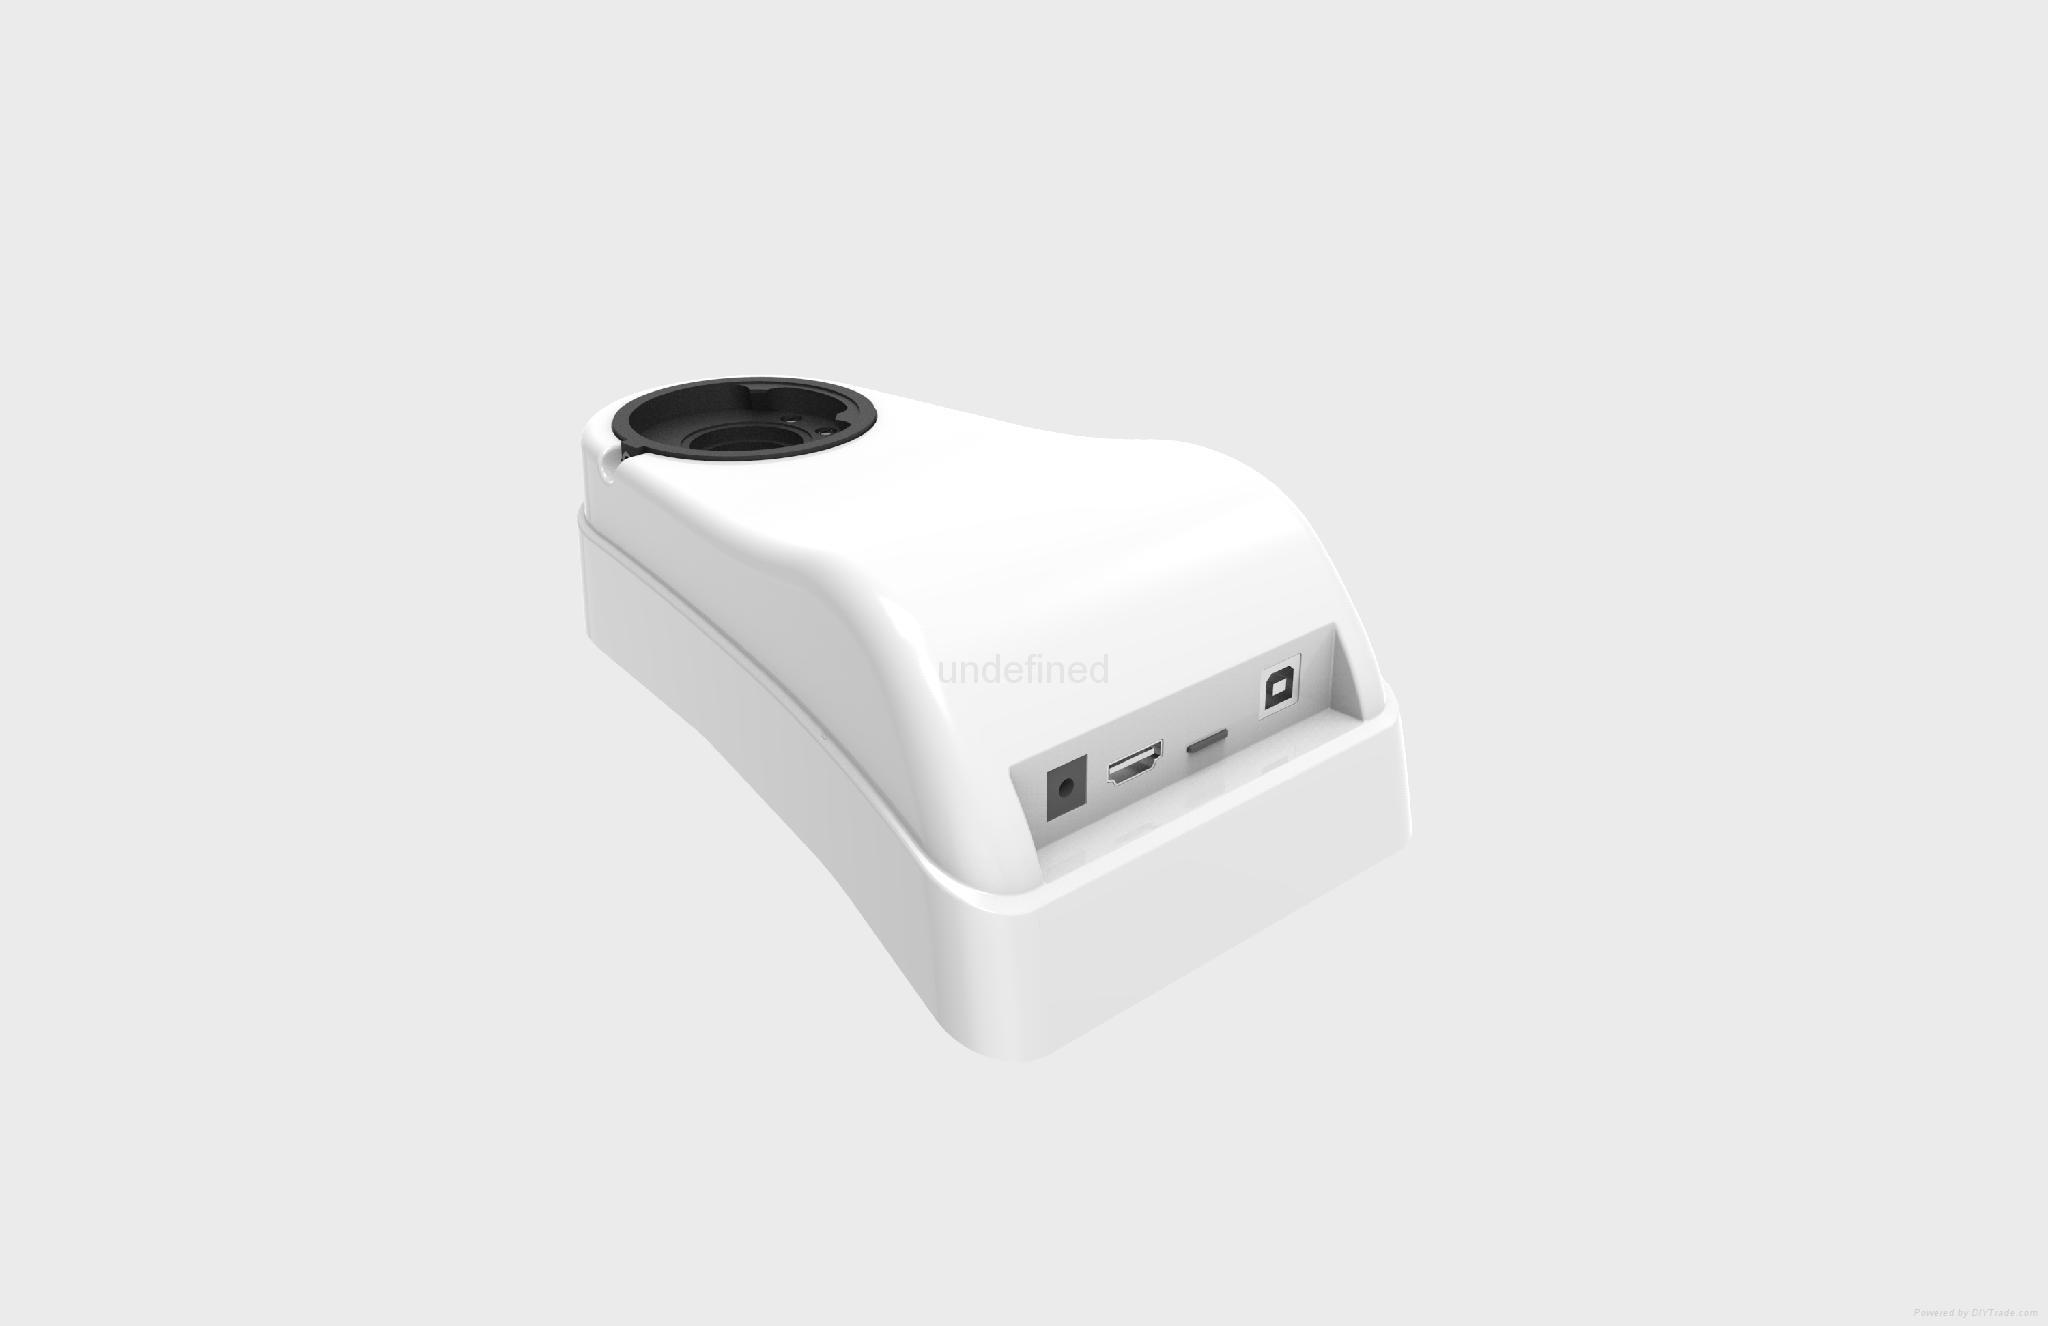 Trinocular converter for CX23 microscope